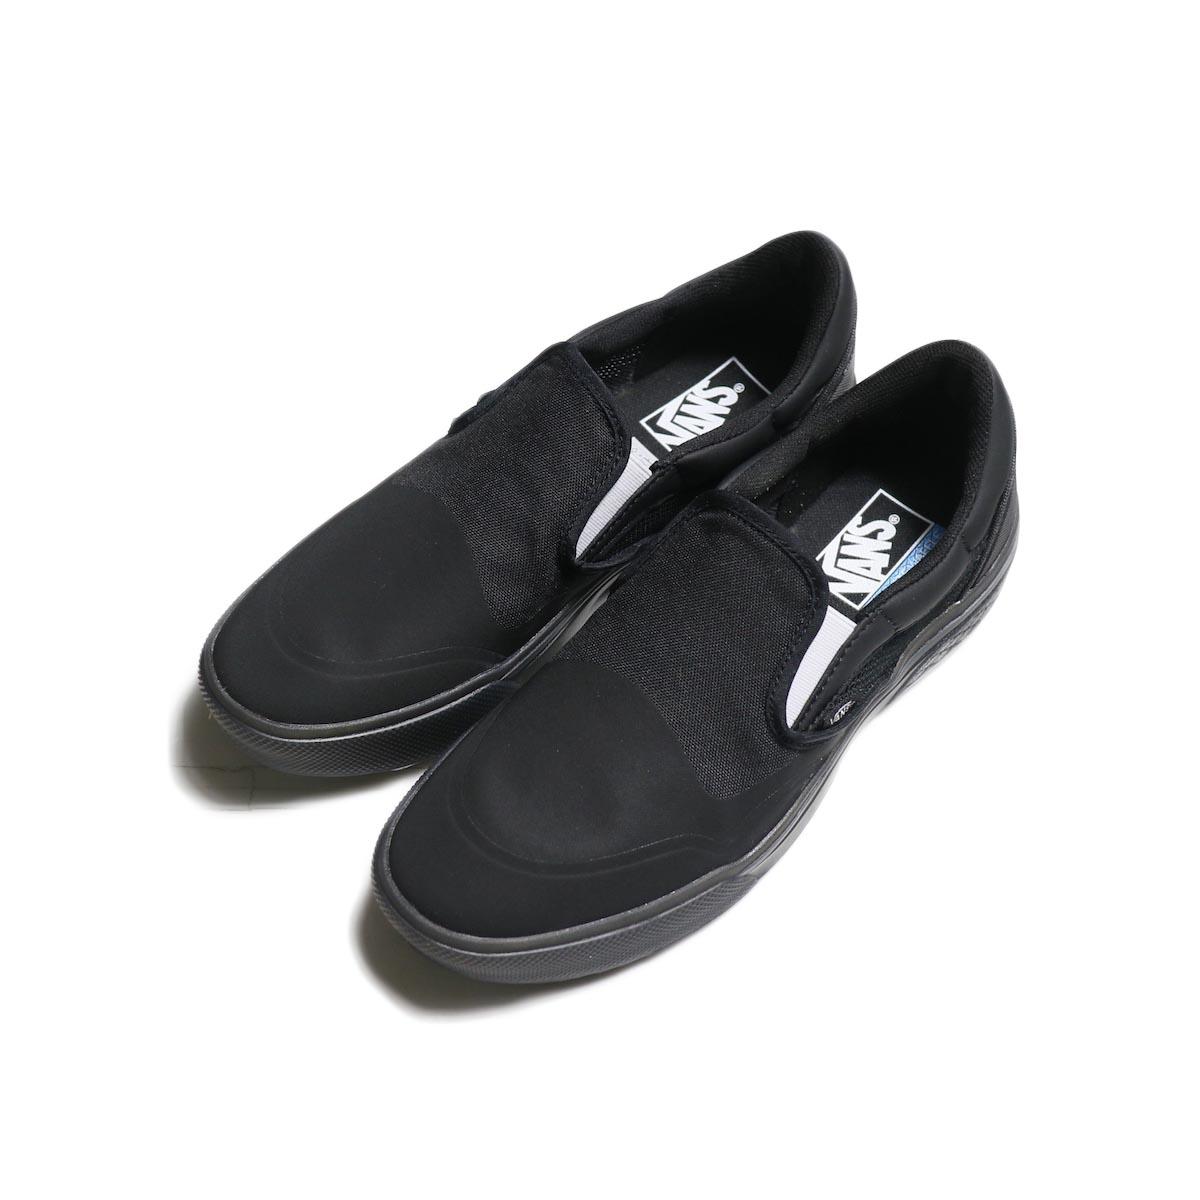 VANS / MOD SLIP-ON (Black/Smoke)